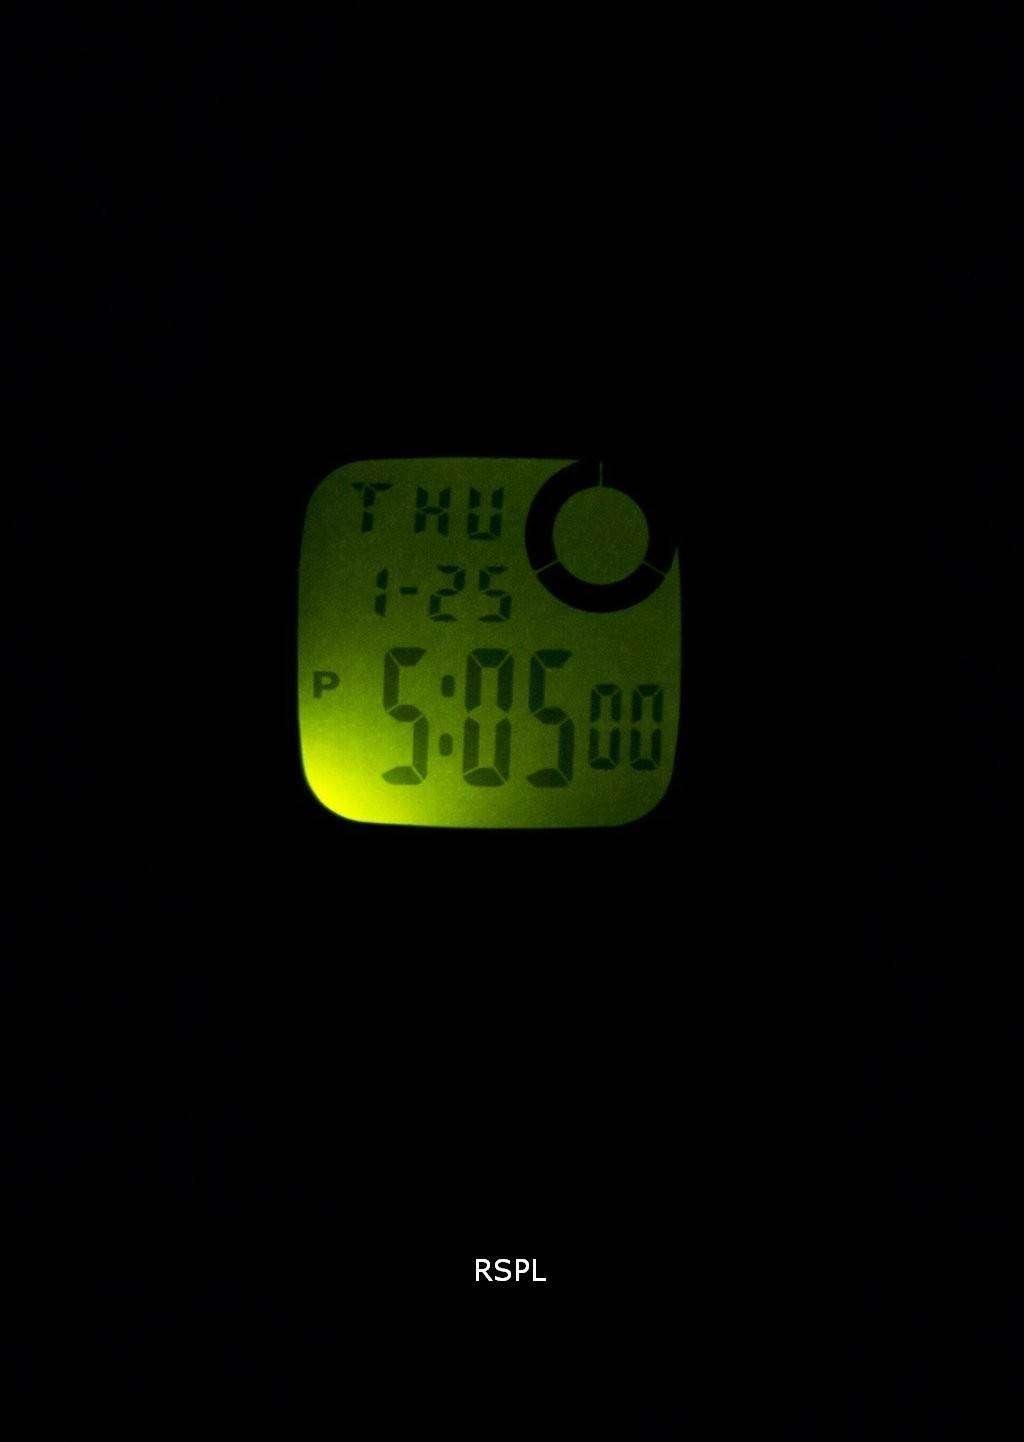 casio illuminator dual time alarm chrono f 200w 9asdf f200w 9asdf men 39 s watch downunderwatches. Black Bedroom Furniture Sets. Home Design Ideas